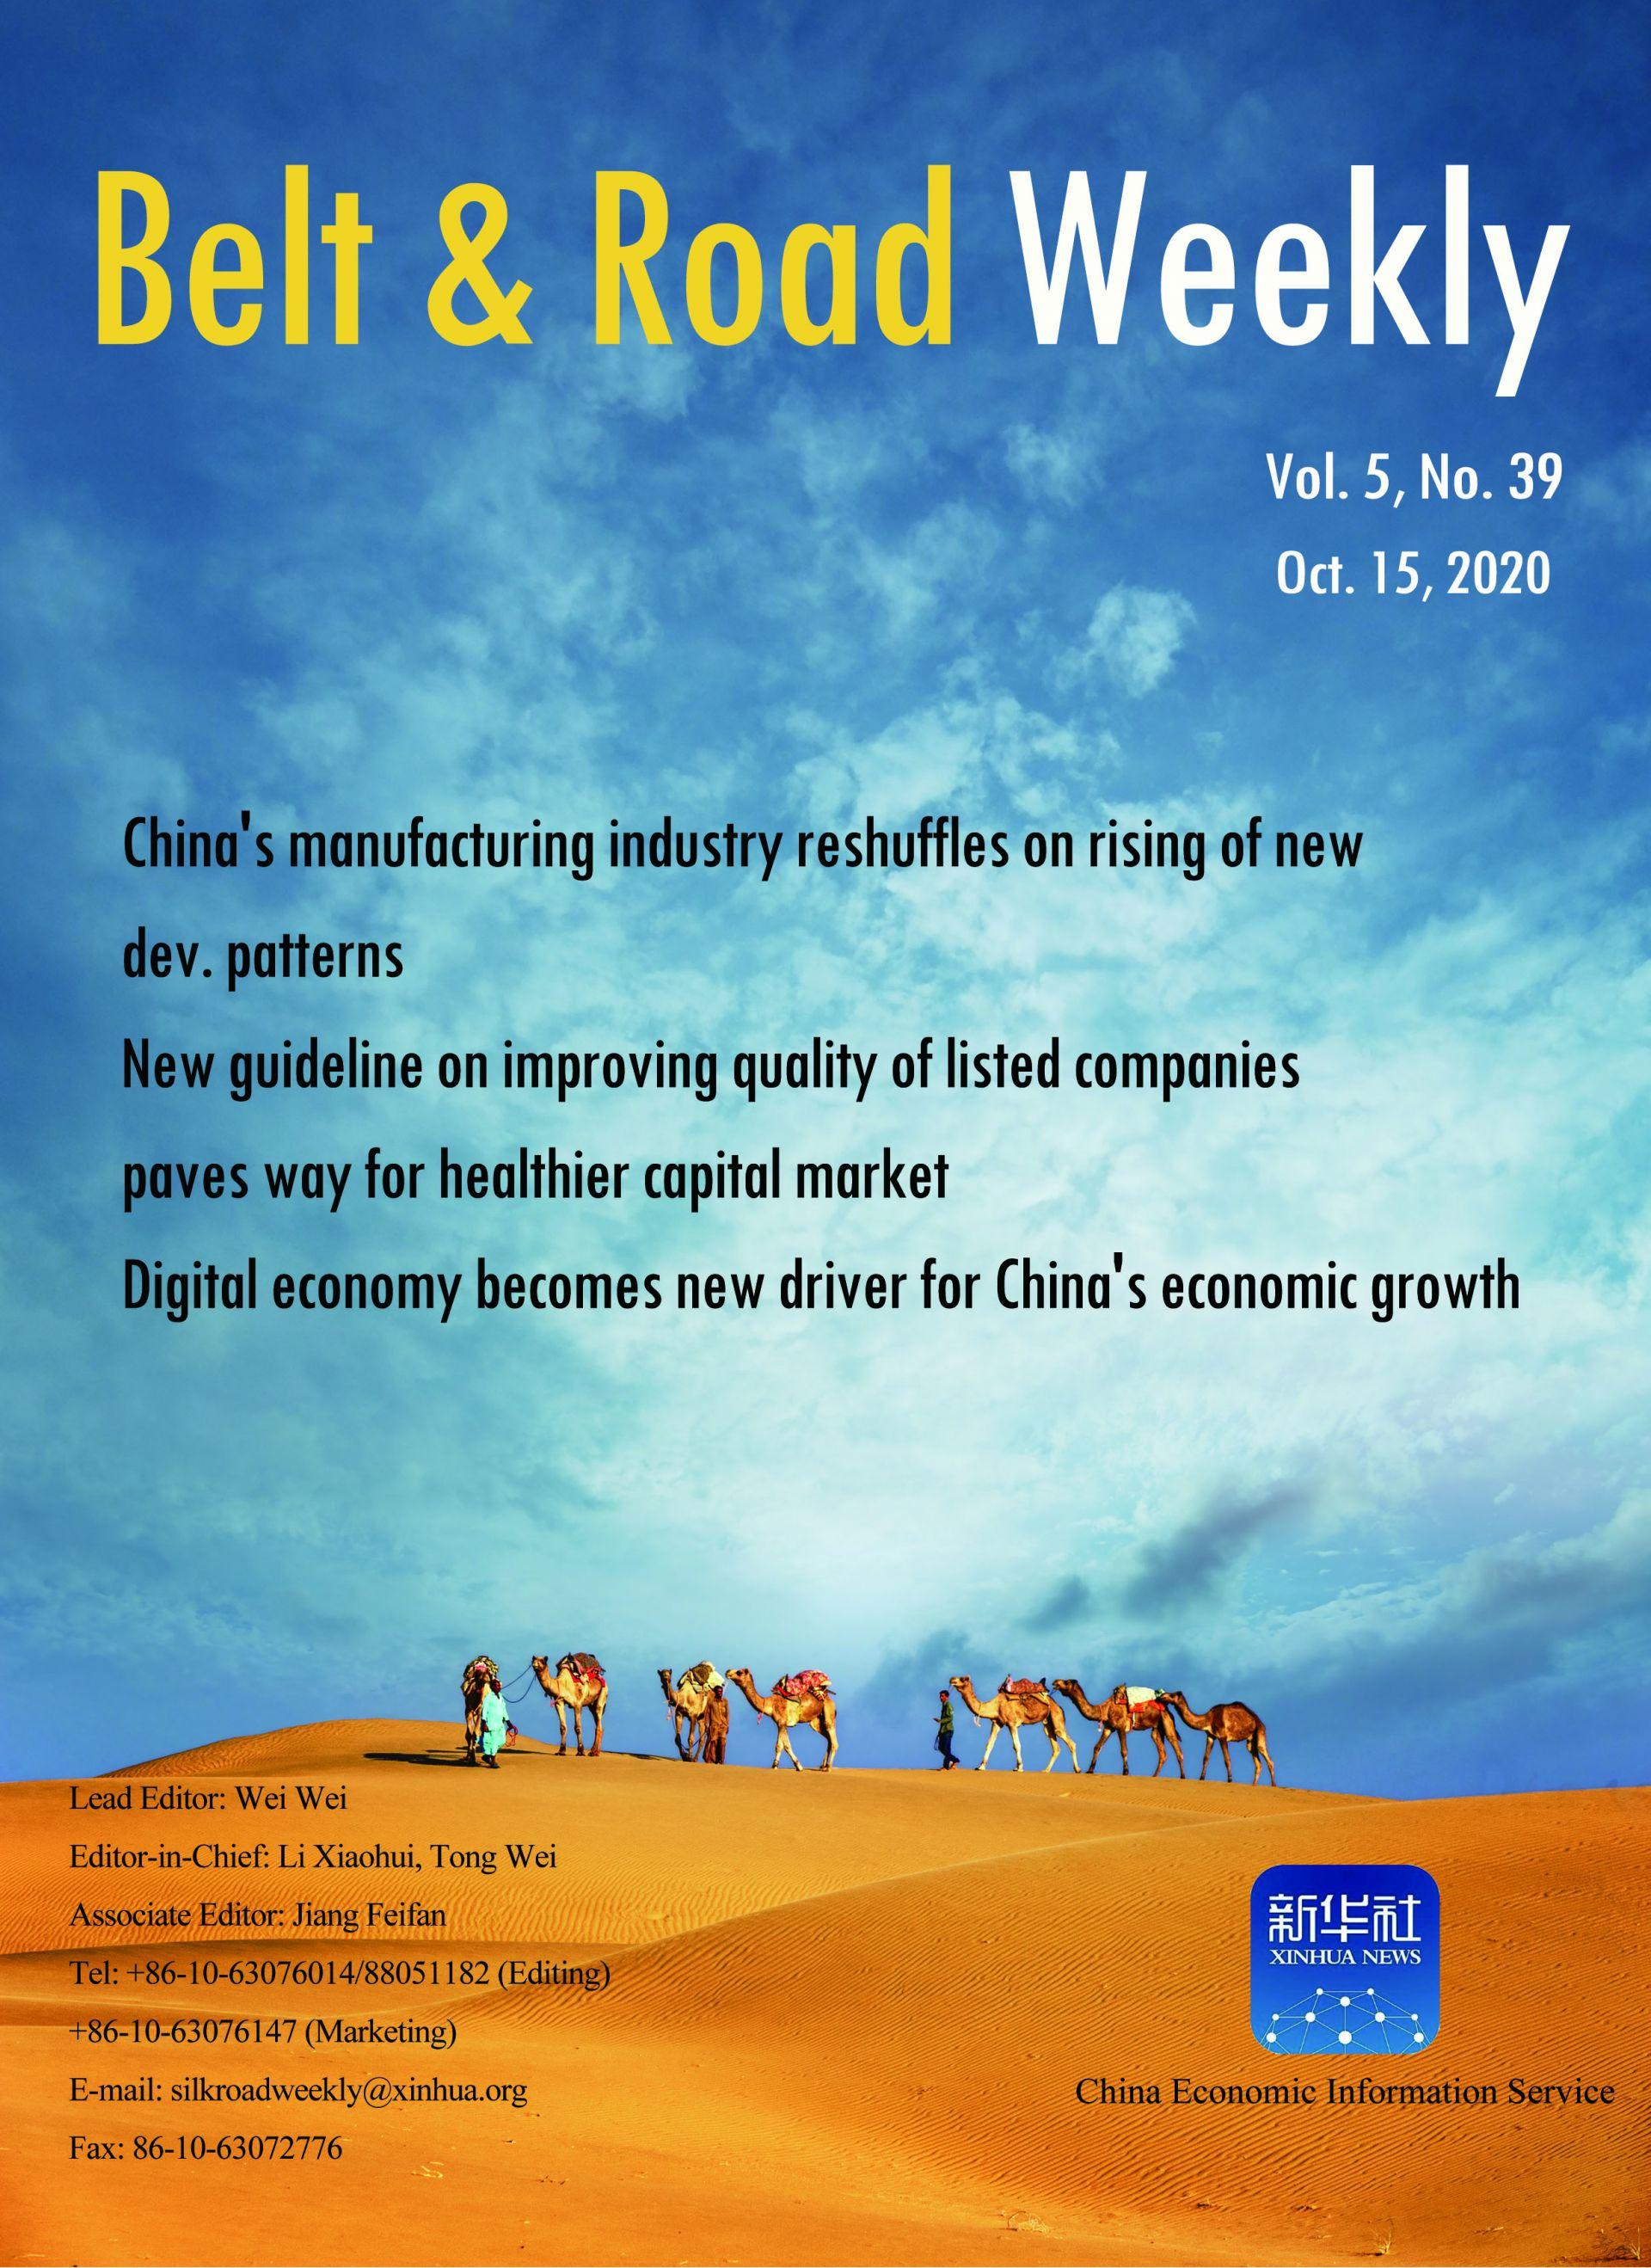 Belt and Road Weekly Vol. 5, No. 39